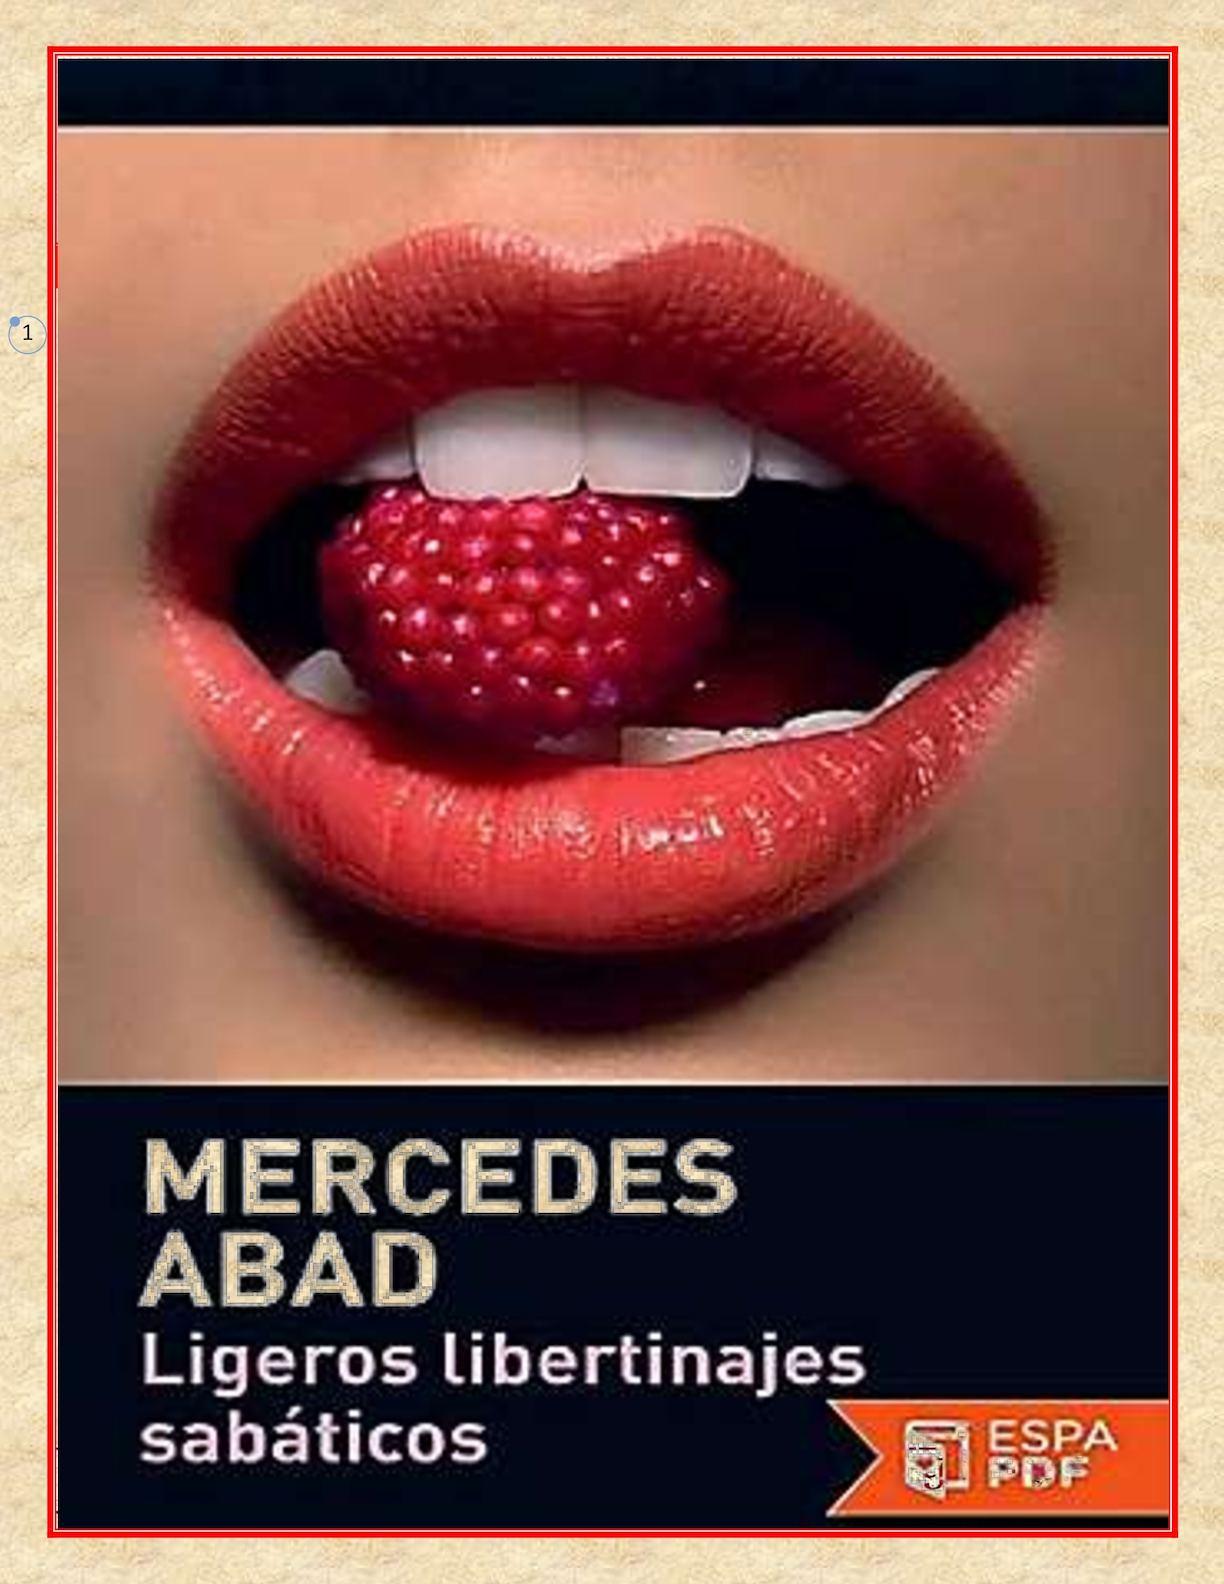 Libro N° 3432 Ligeros Libertinajes Sabáticos Abad, Mercedes Colección E O Enero 7 De 2017